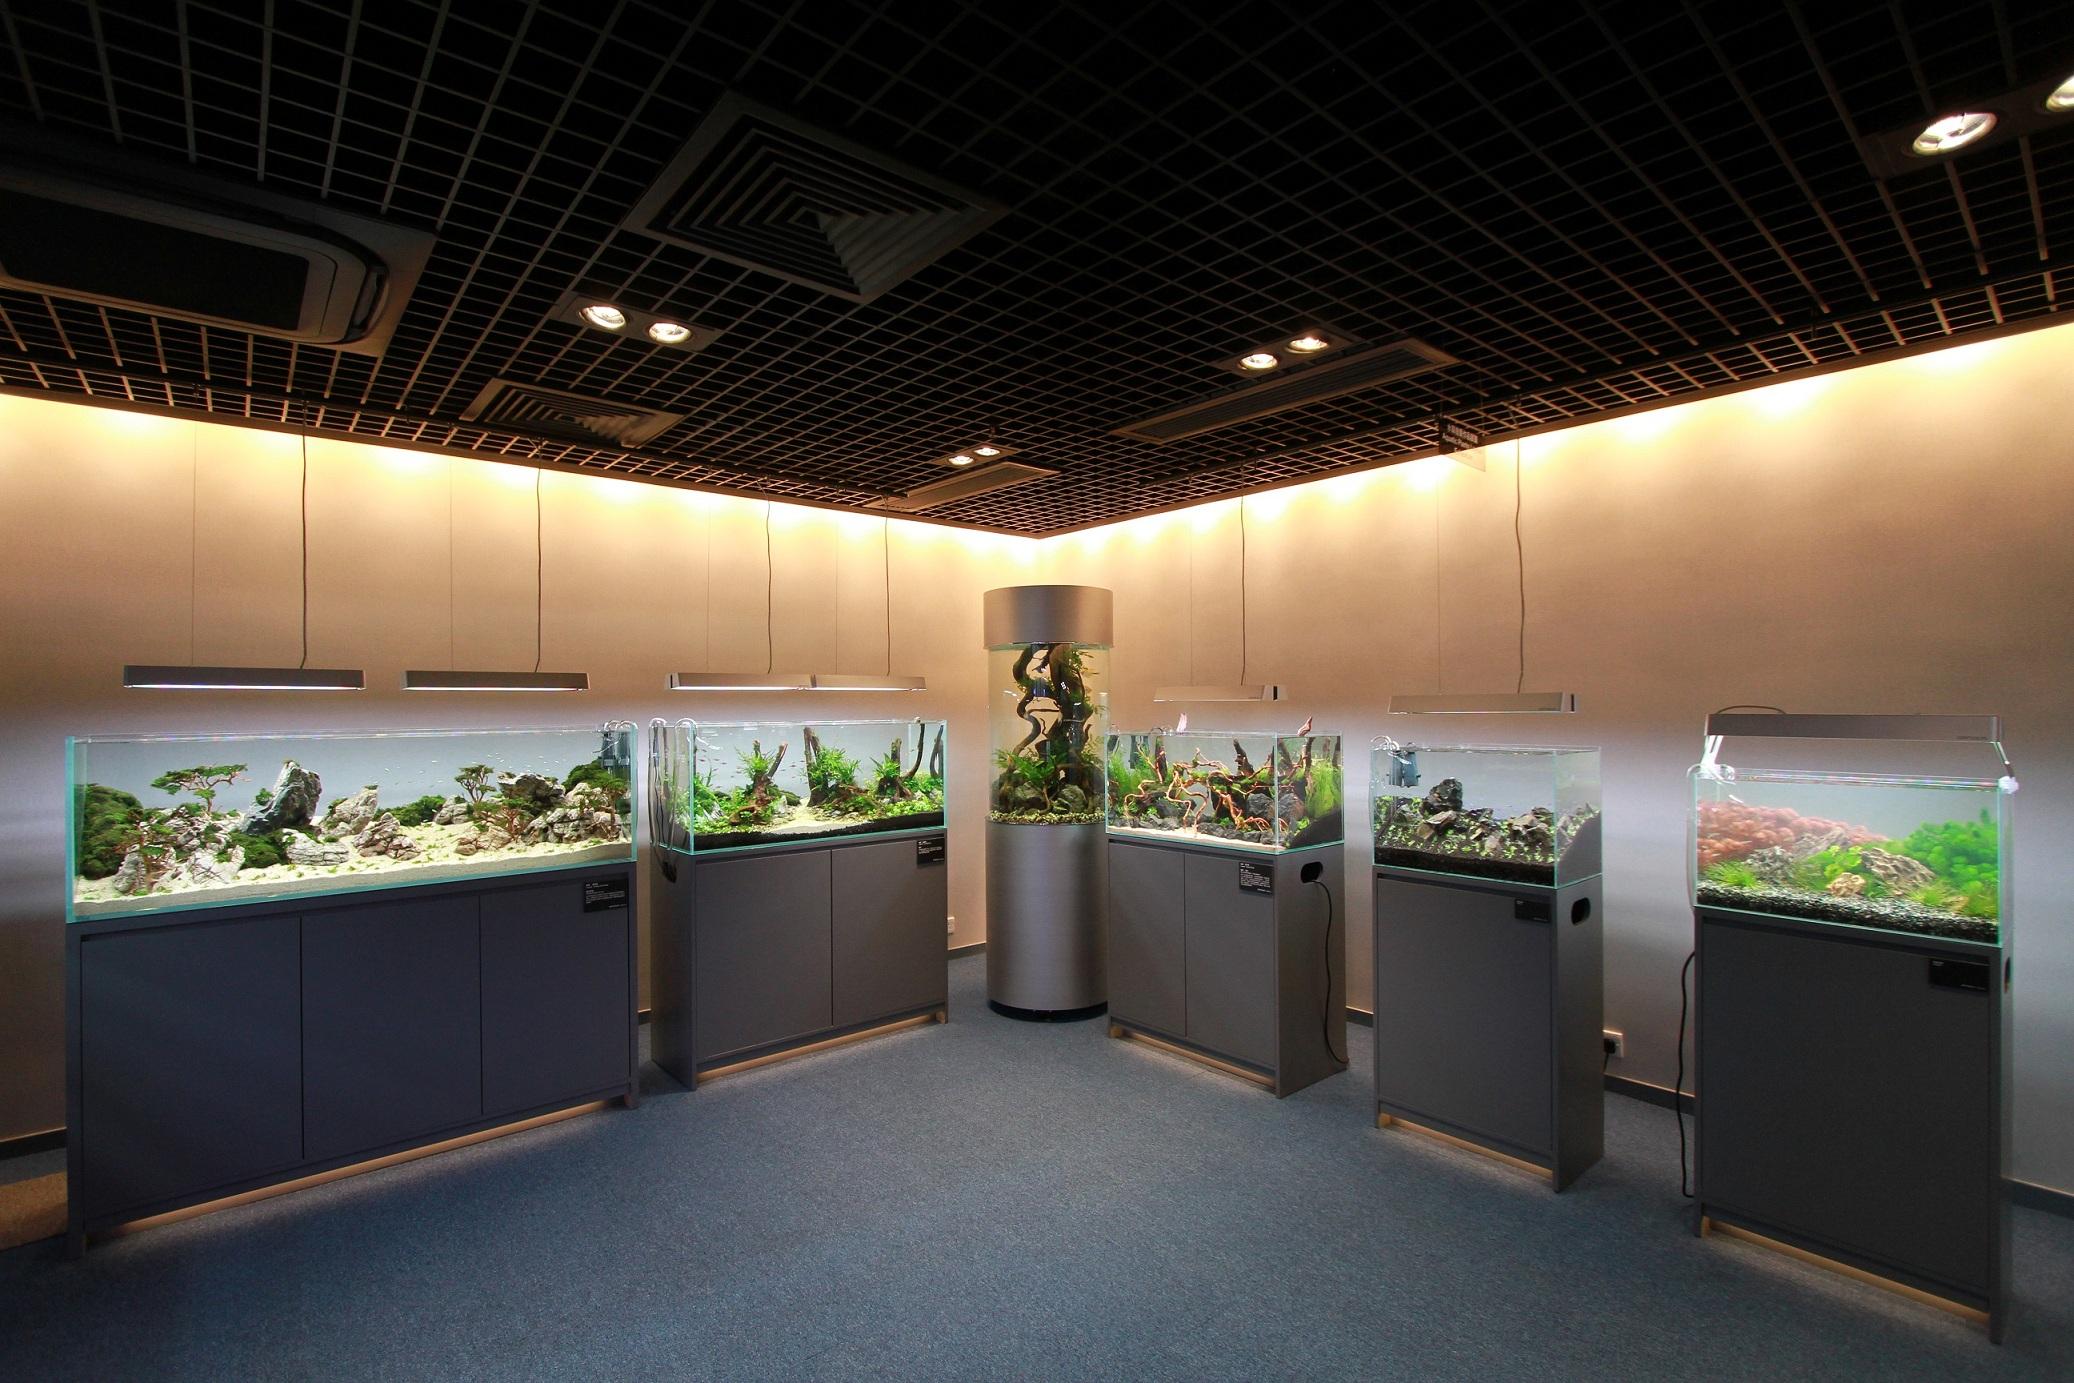 led lighting interior. OPNOVA Gallery A Revolution In Aquatic Lighting - OPTILED Technologies LED Solution, Lamp, Fixture For Office, Shop, Interior Design, Led .